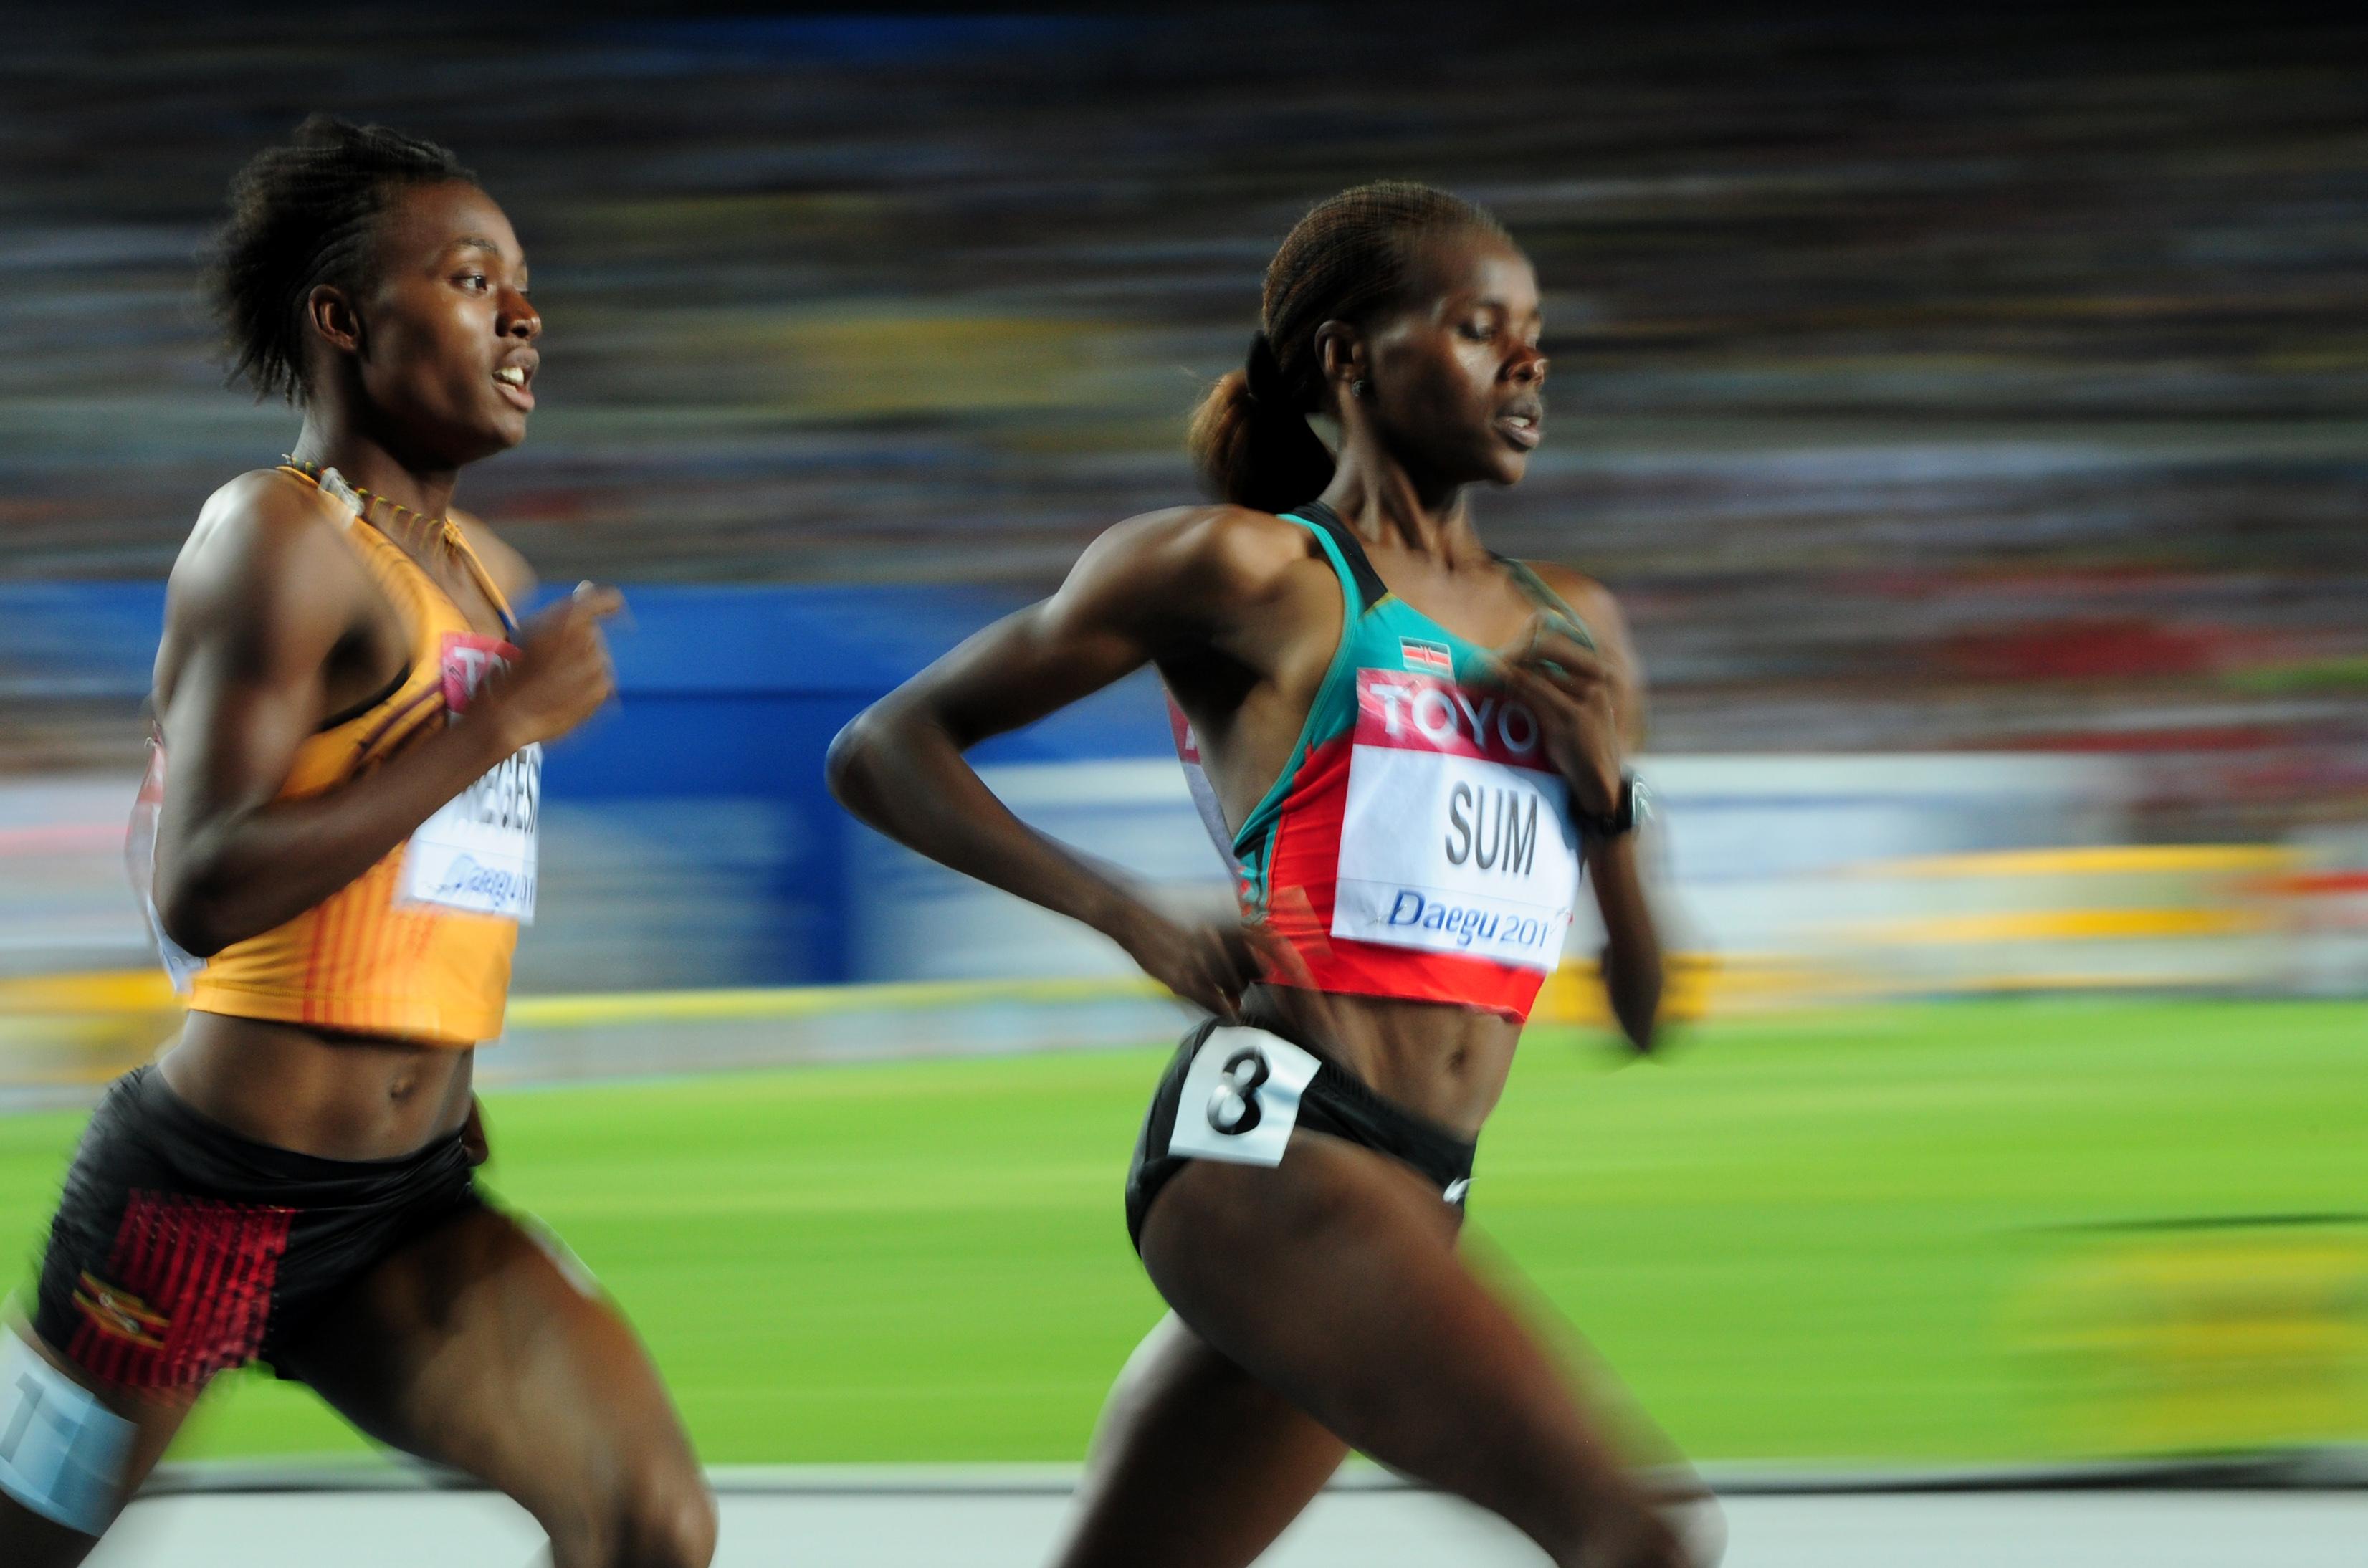 (L/R) Uganda's Annet Negesa and Kenya's